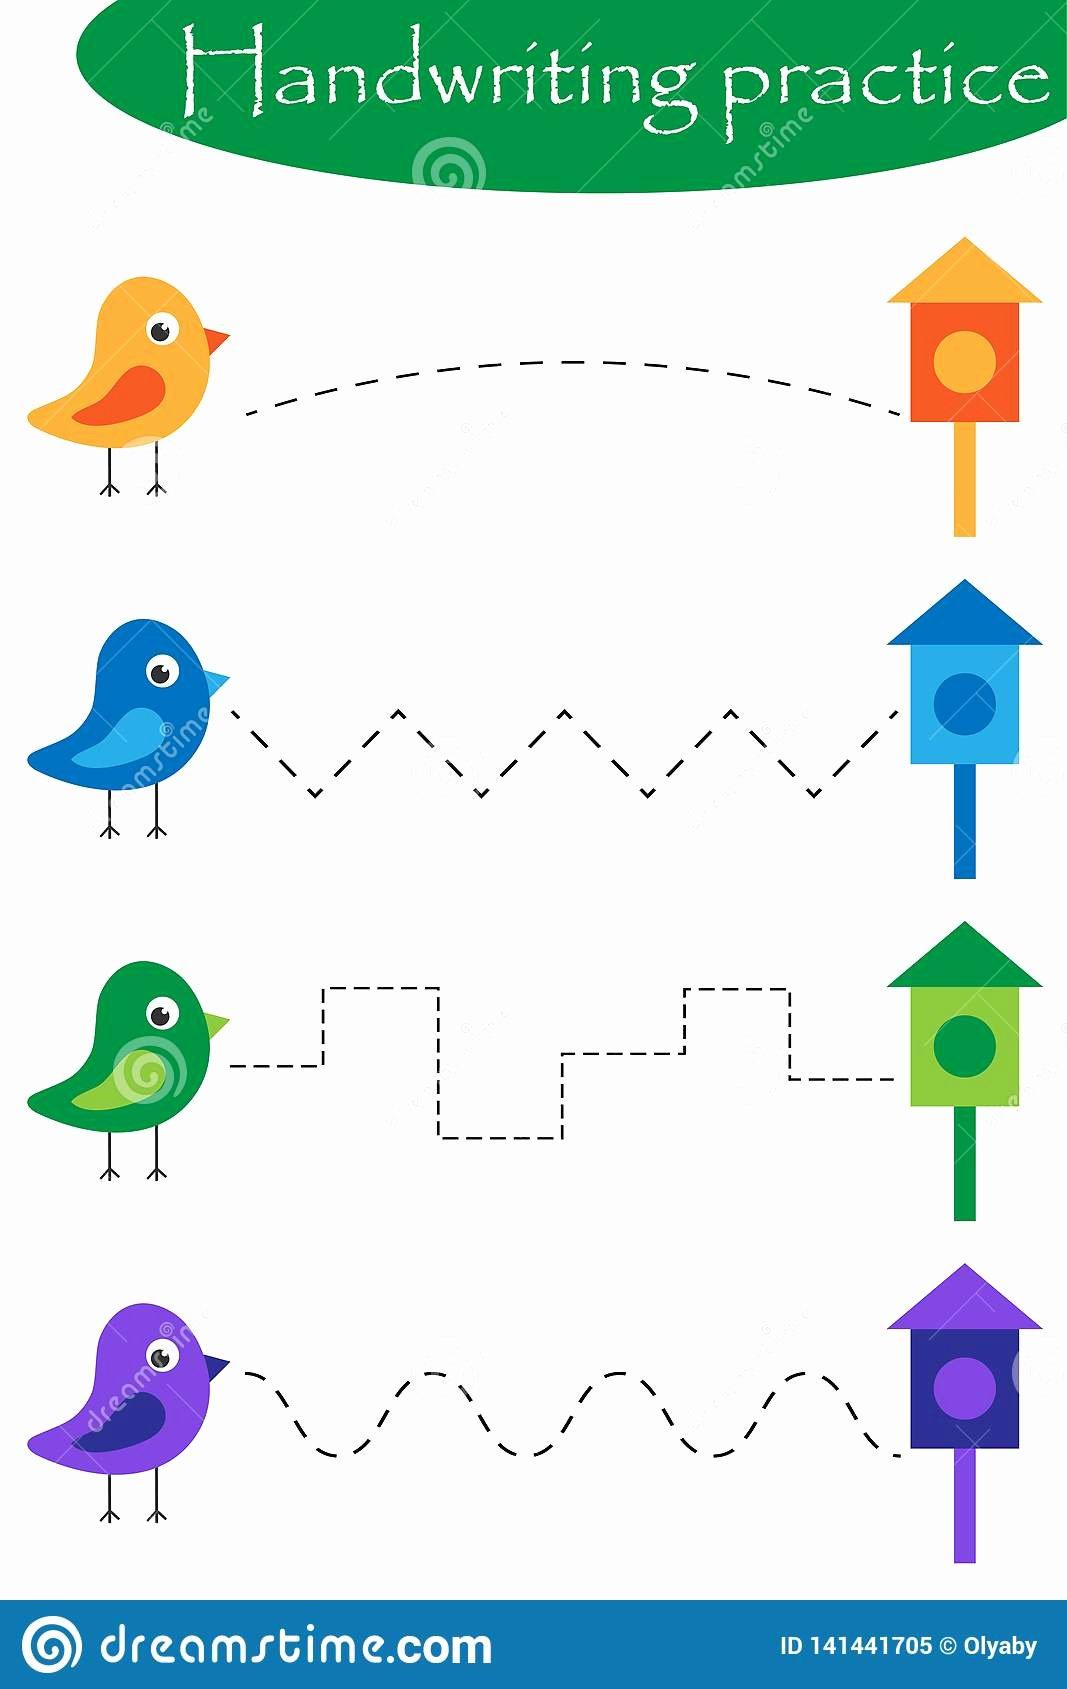 Bird Worksheets for Preschoolers Printable Birds and Nesting Boxes Spring Handwriting Practice Sheet